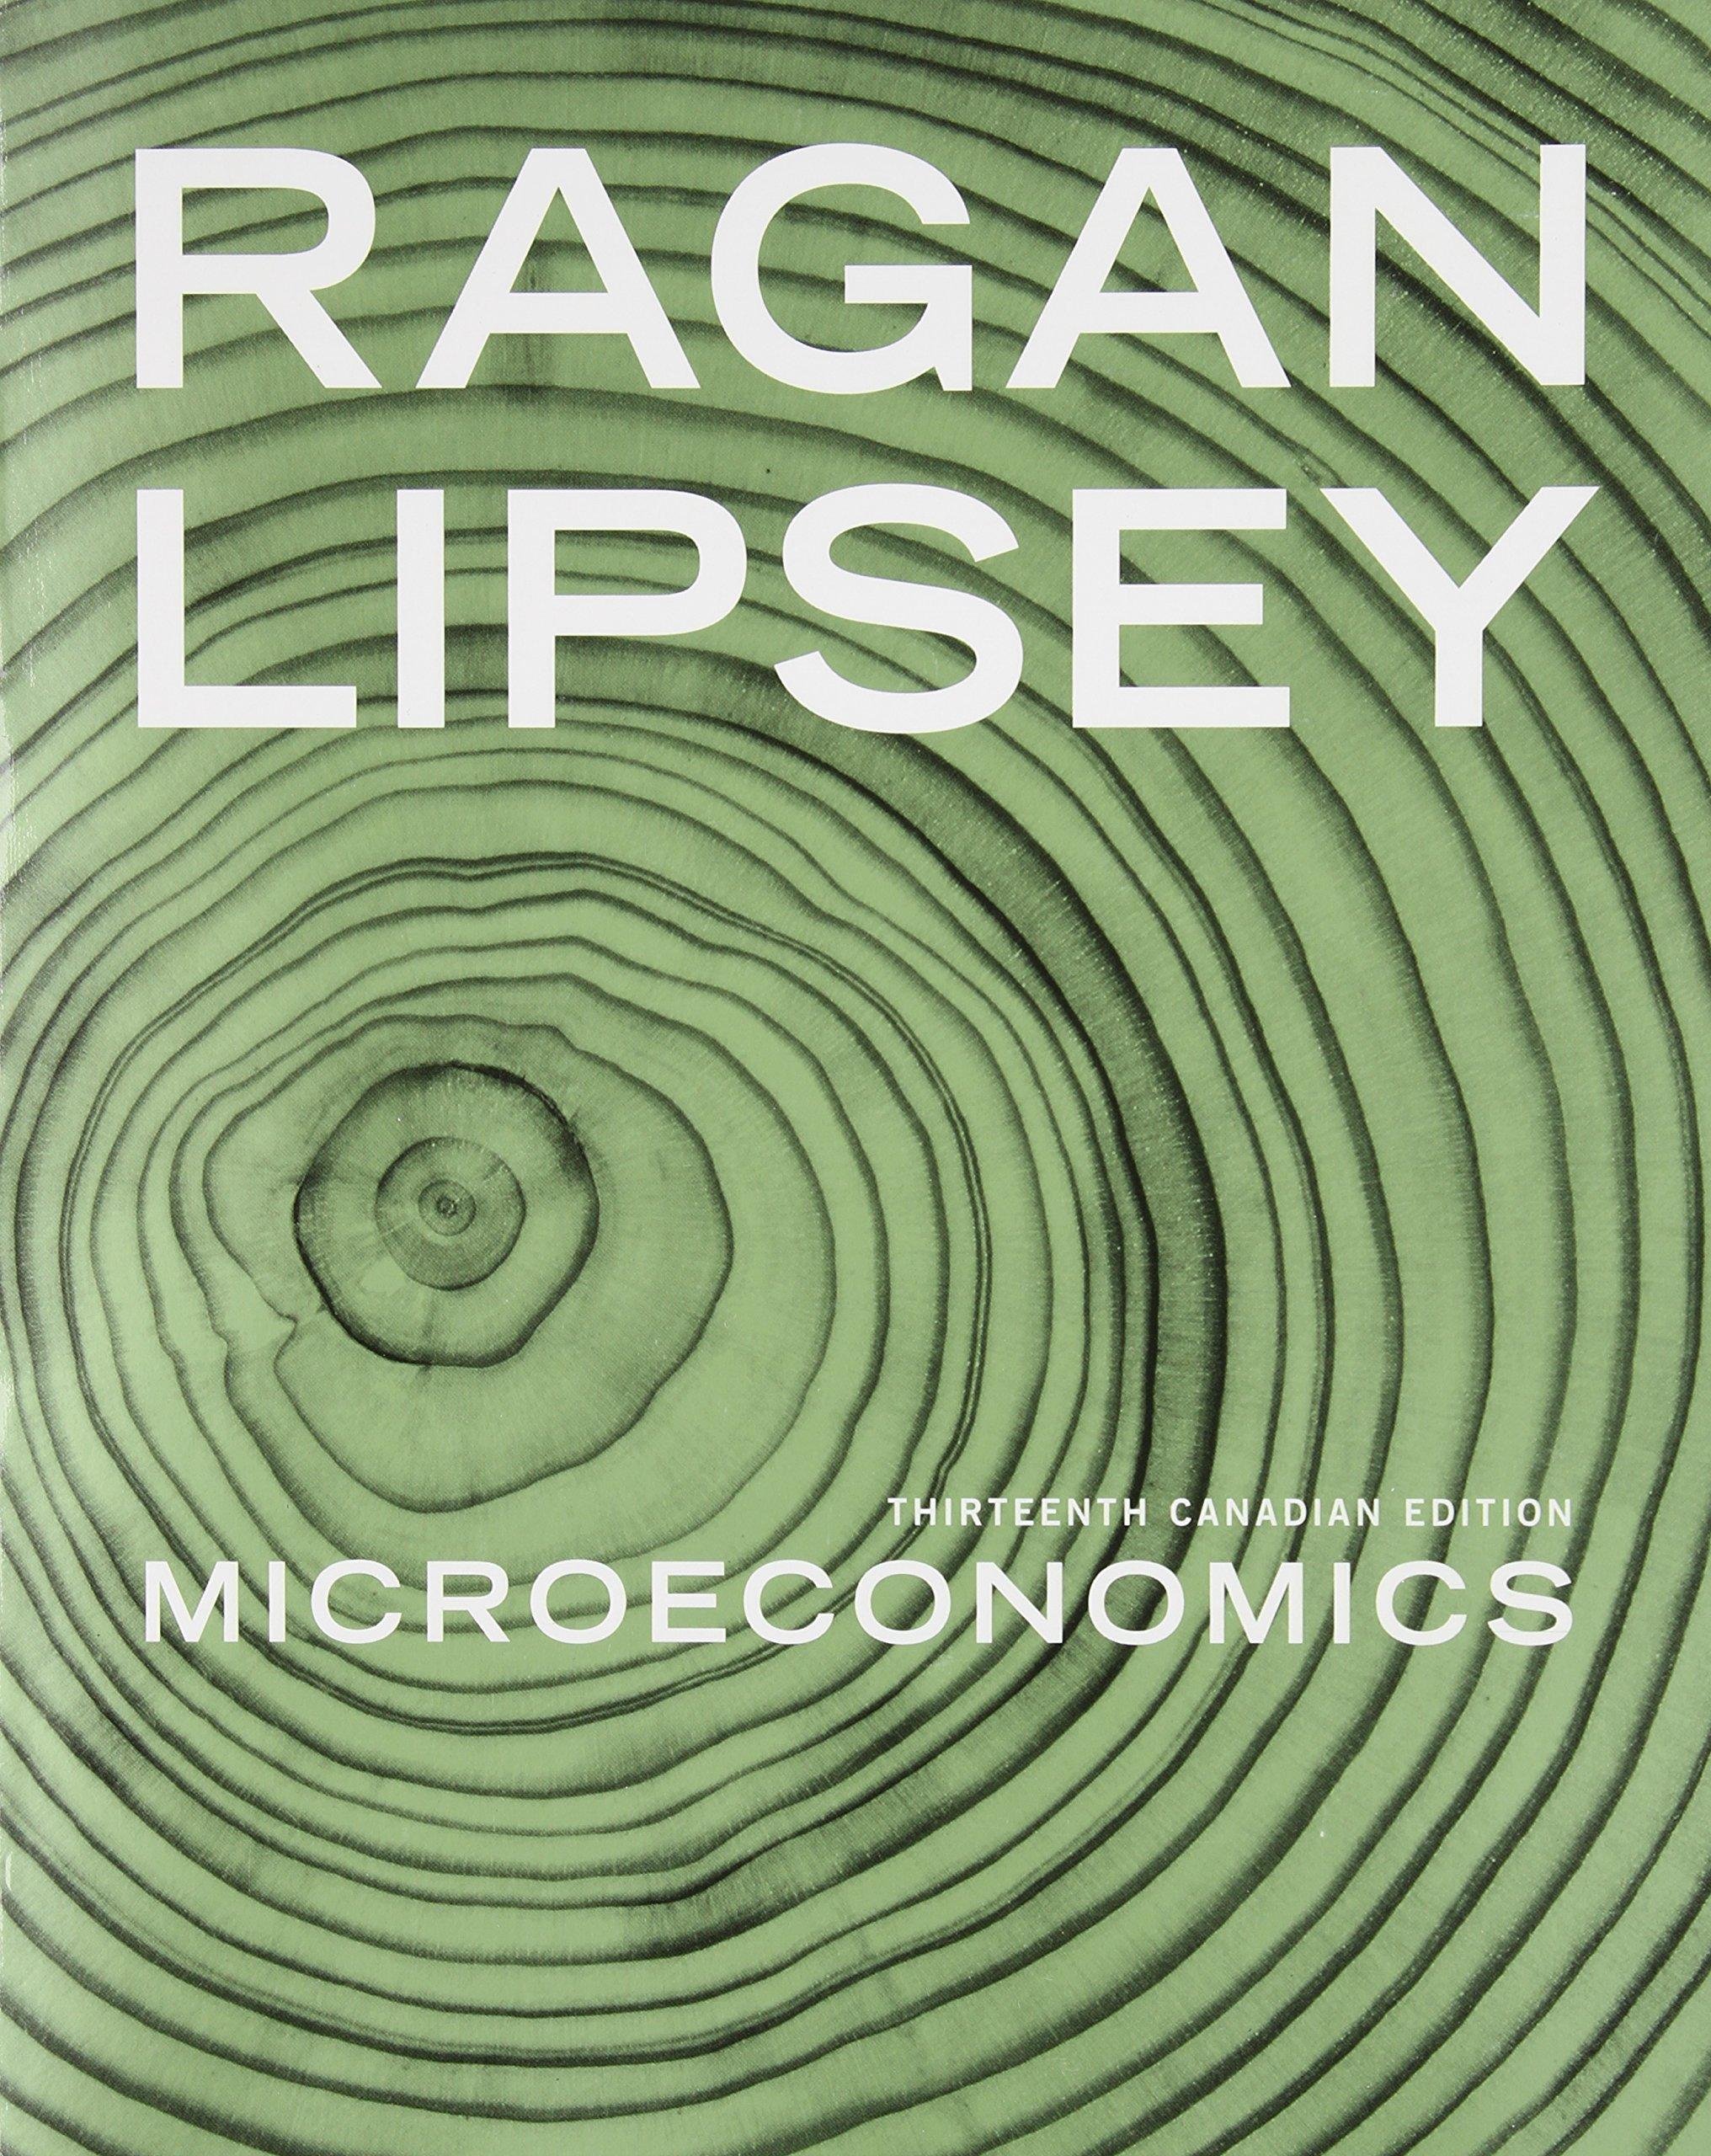 Microeconomics thirteenth canadian edition 13th edition microeconomics thirteenth canadian edition 13th edition christopher ts ragan richard g lipsey 9780321561961 economics amazon canada fandeluxe Gallery